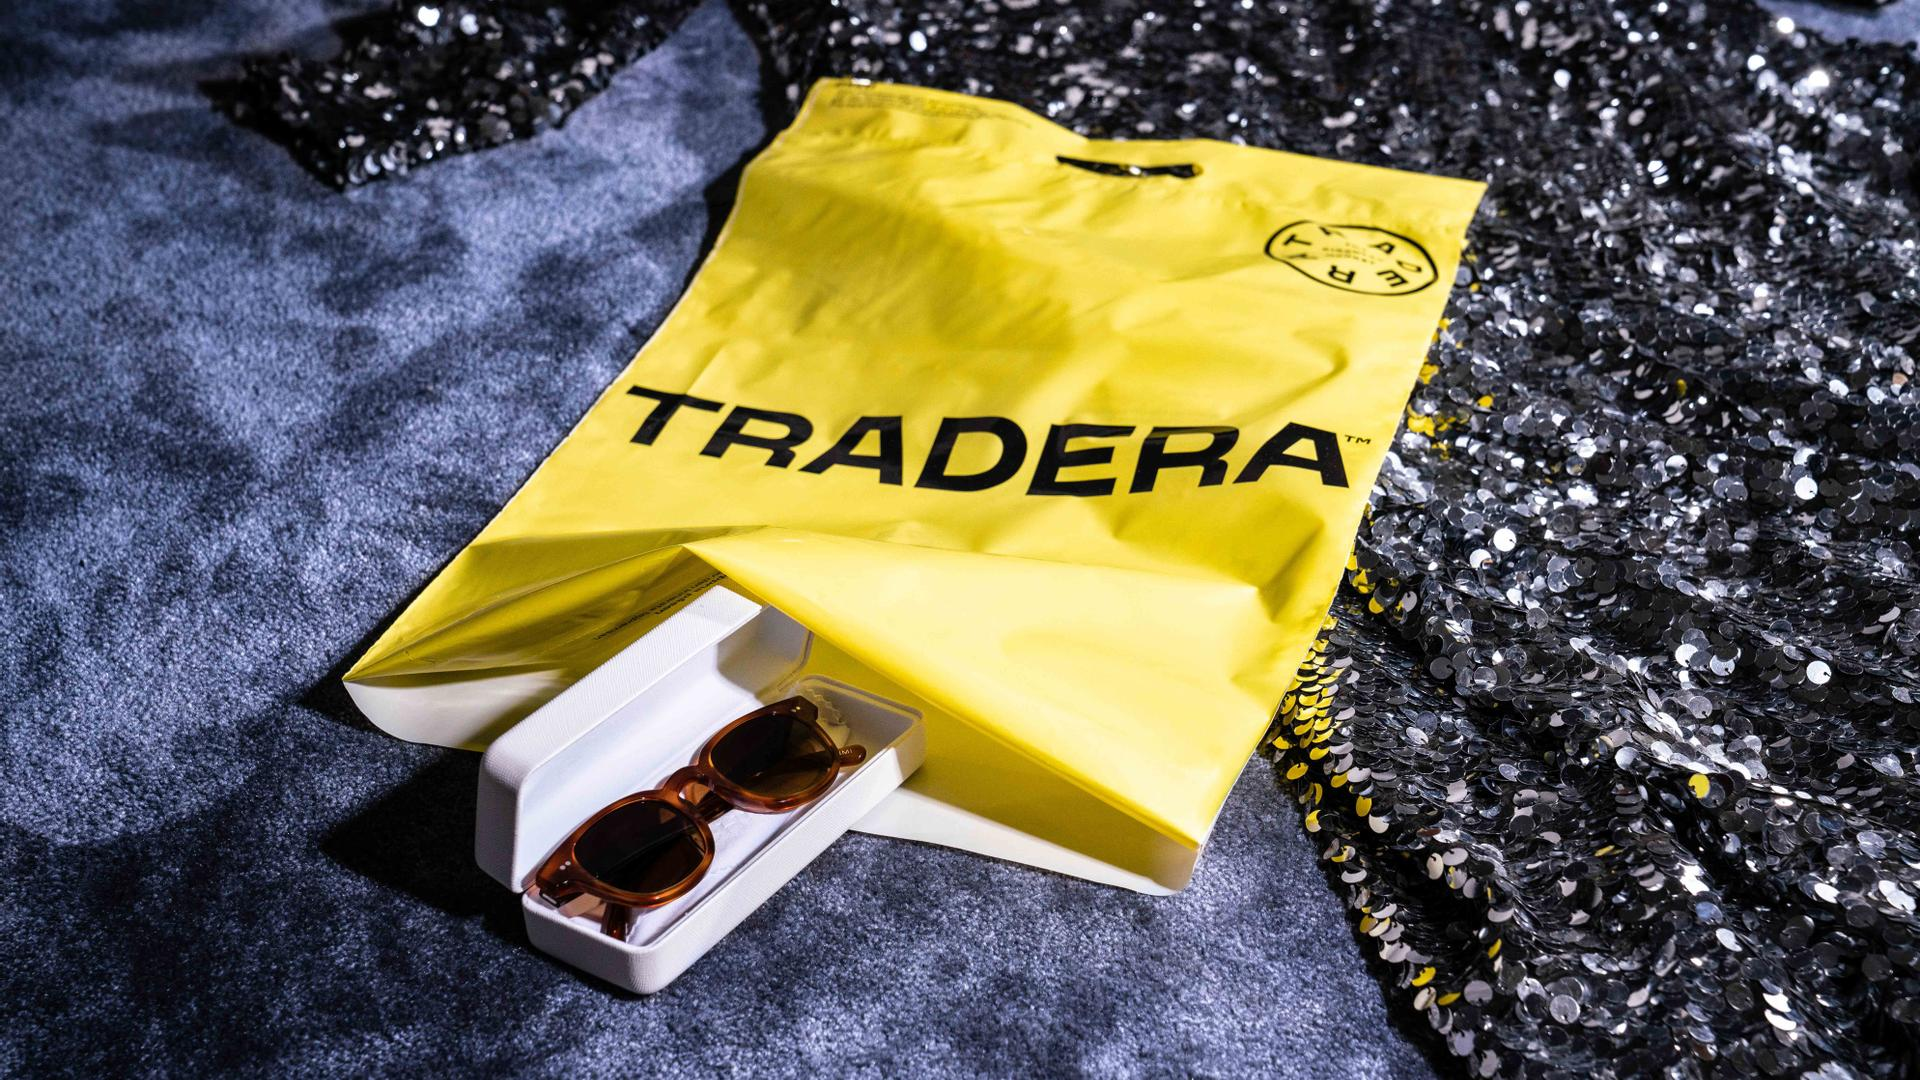 Tradera Shop Omslagsbild